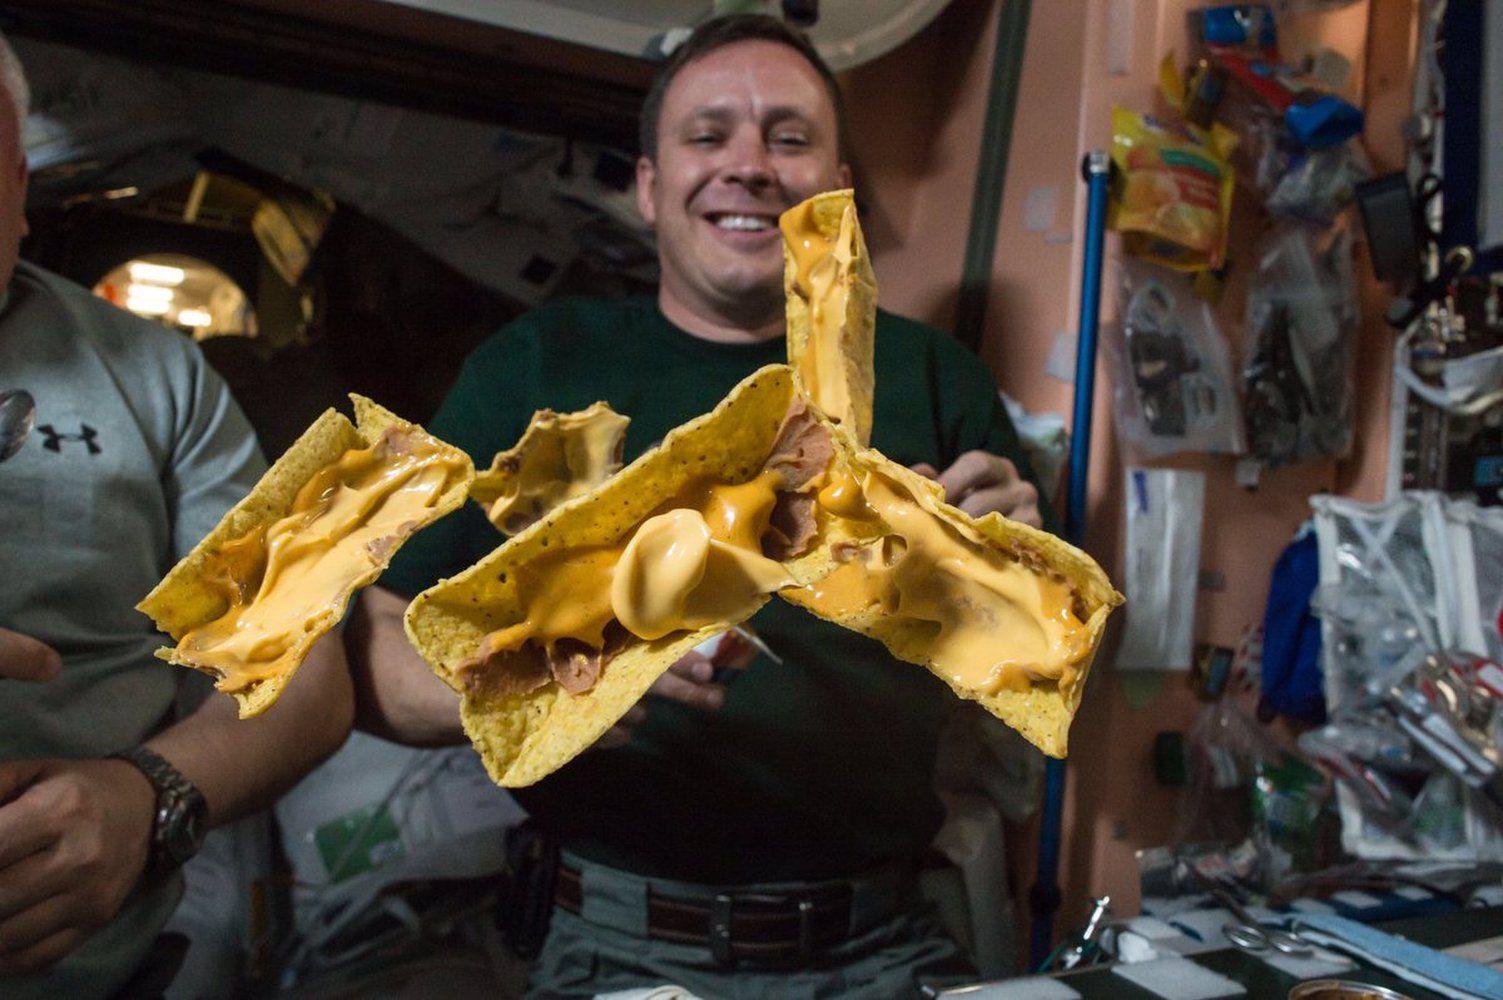 astronaut taco space - photo #19